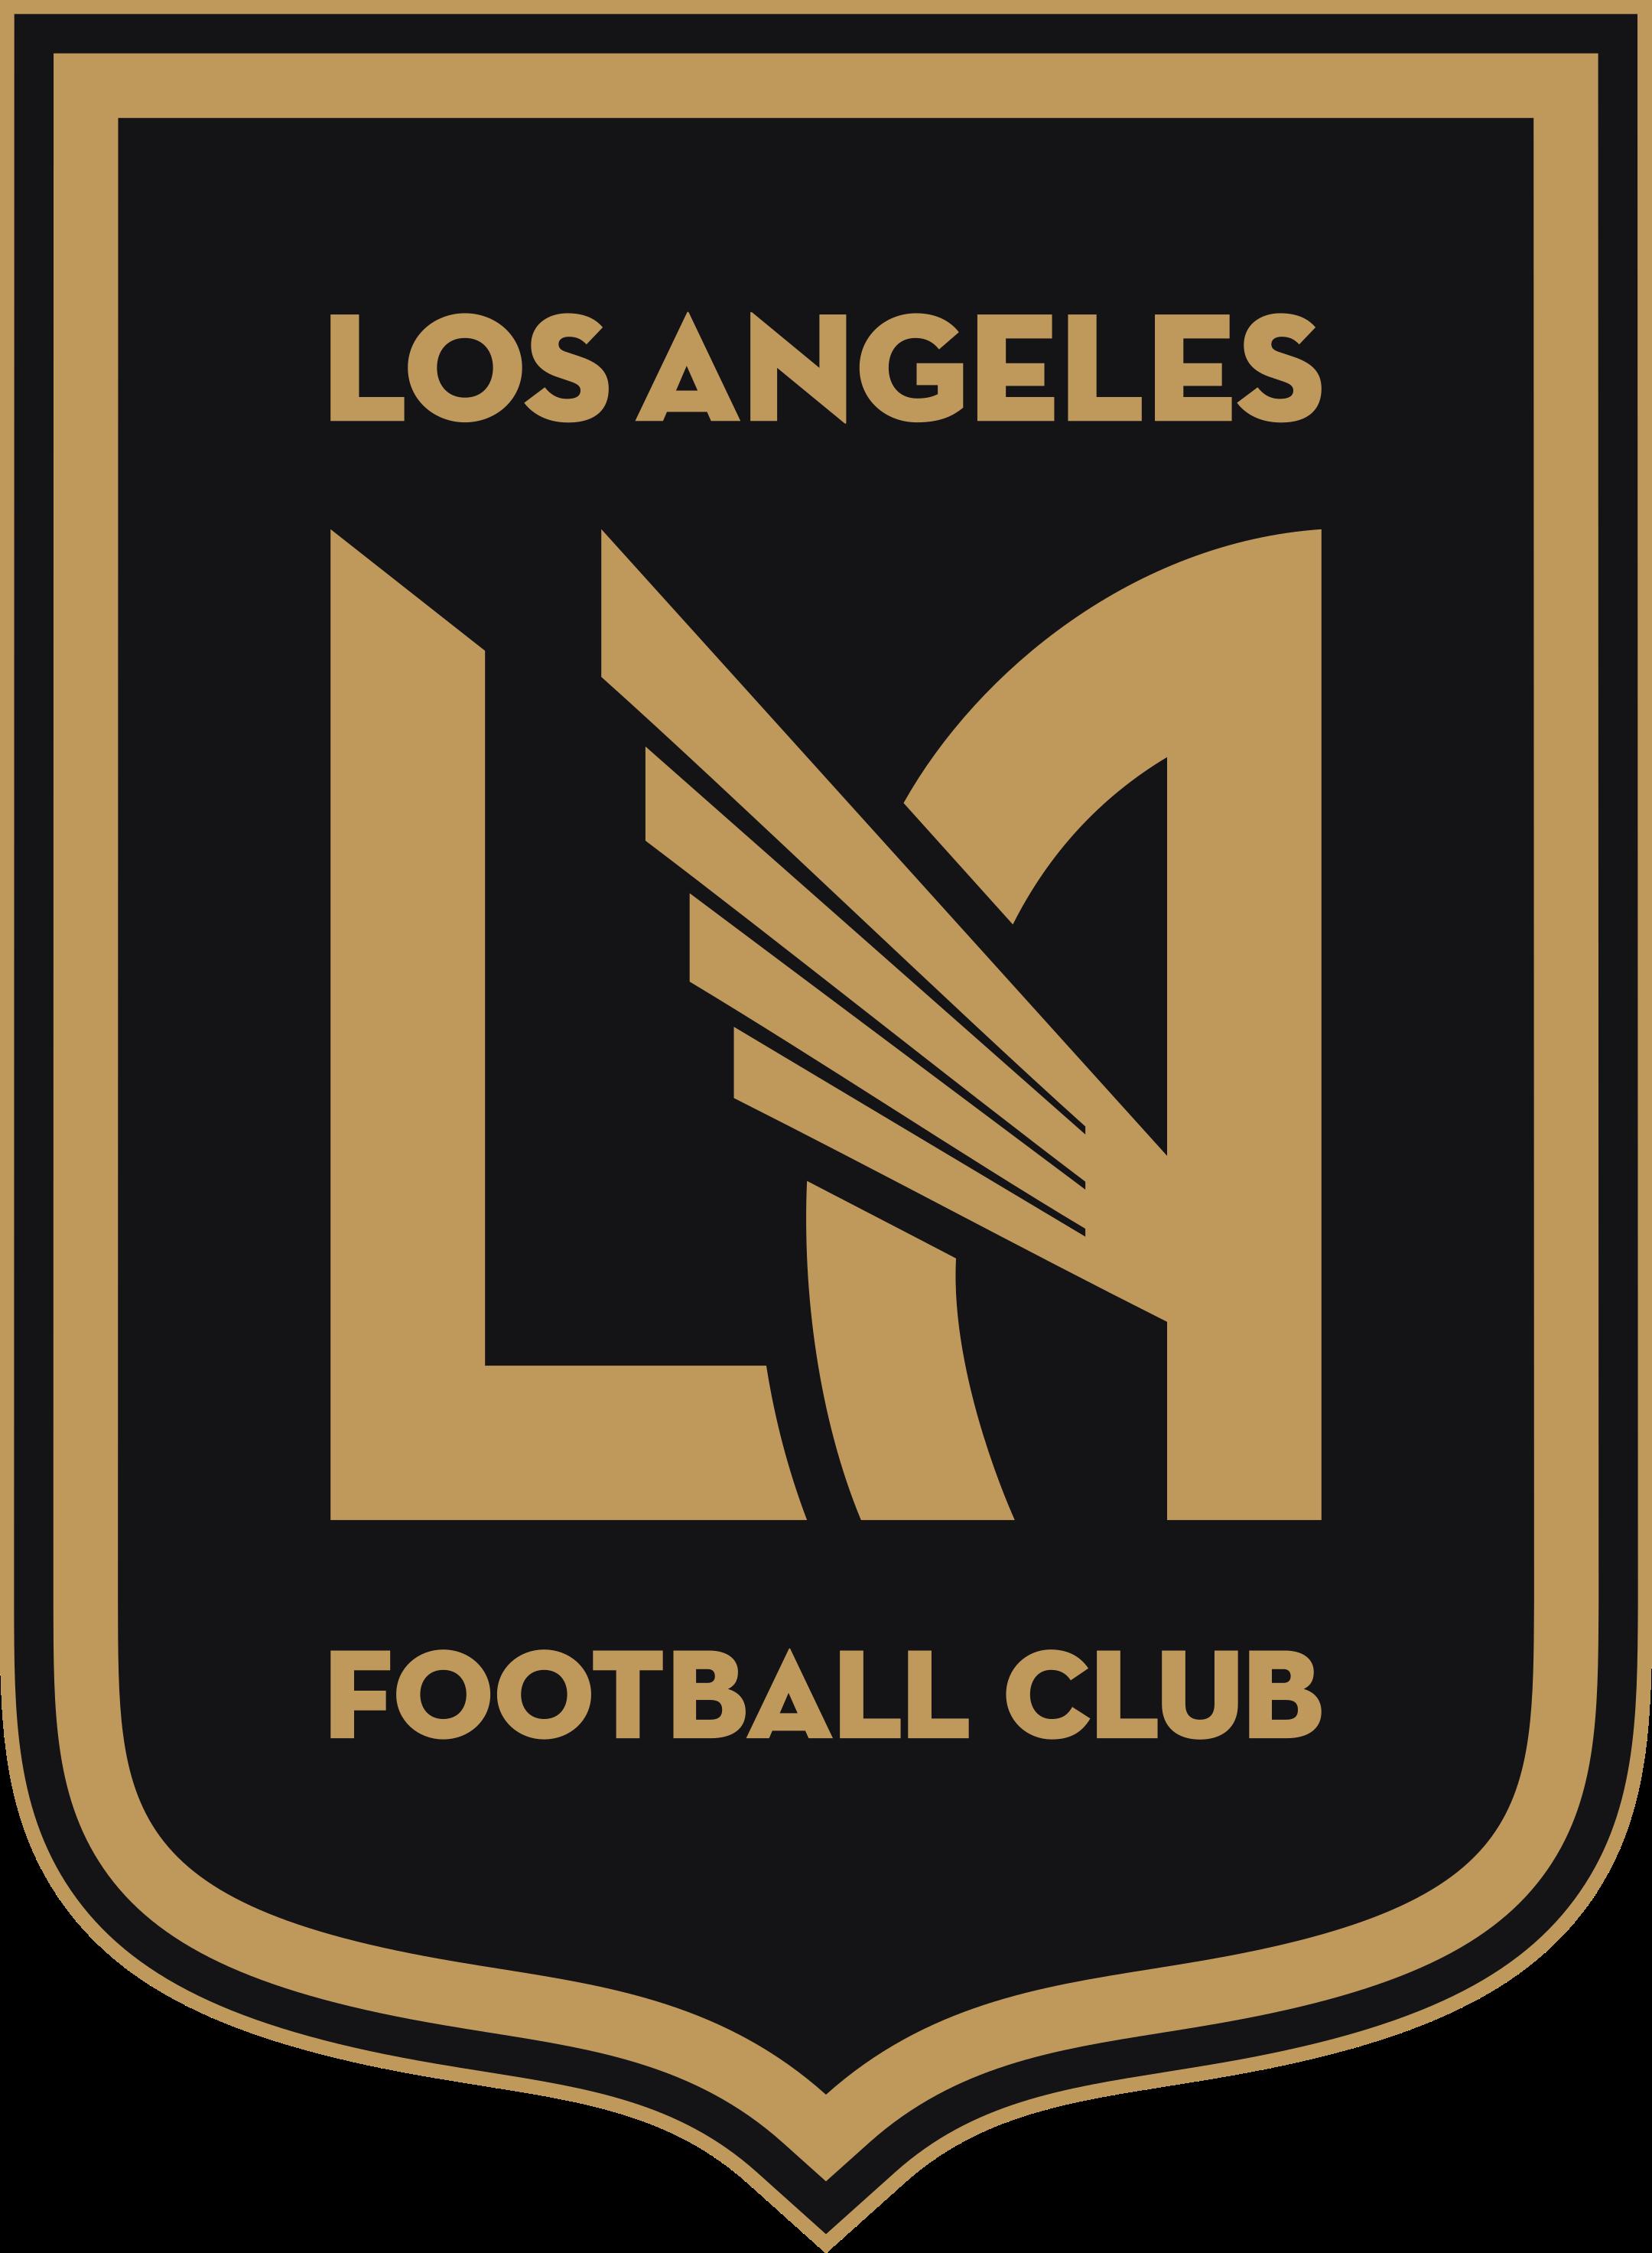 los angeles fc logo 1 - Los Angeles FC Logo